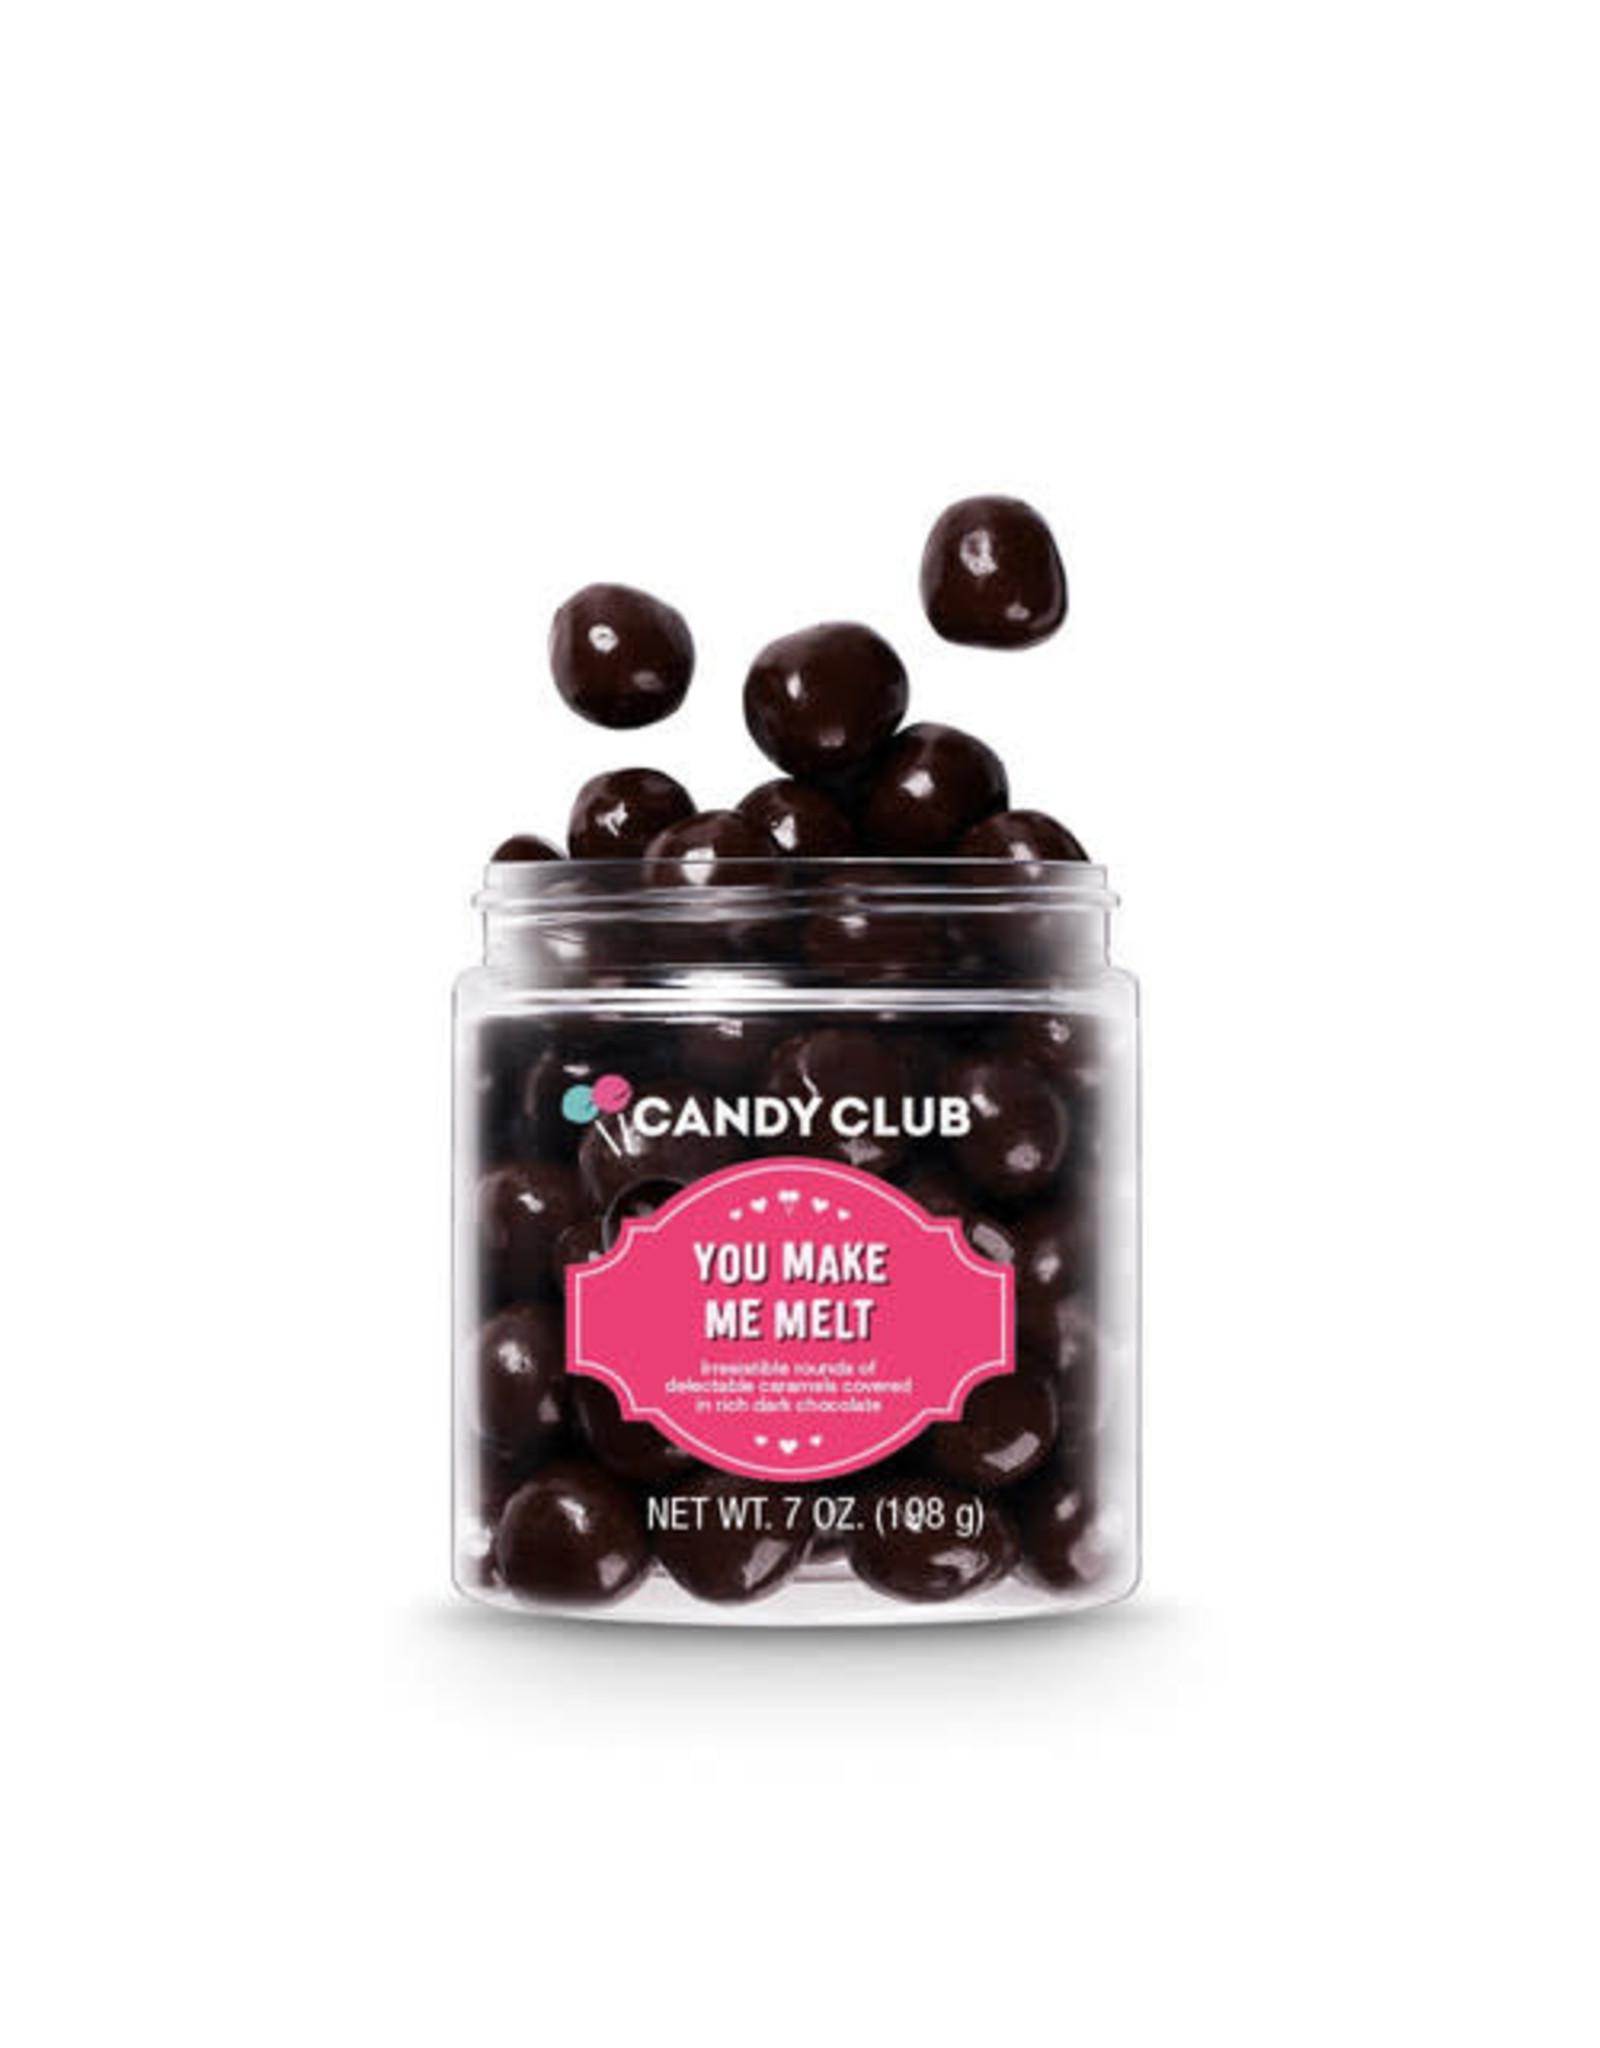 Candy Club You Make Me Melt Candy